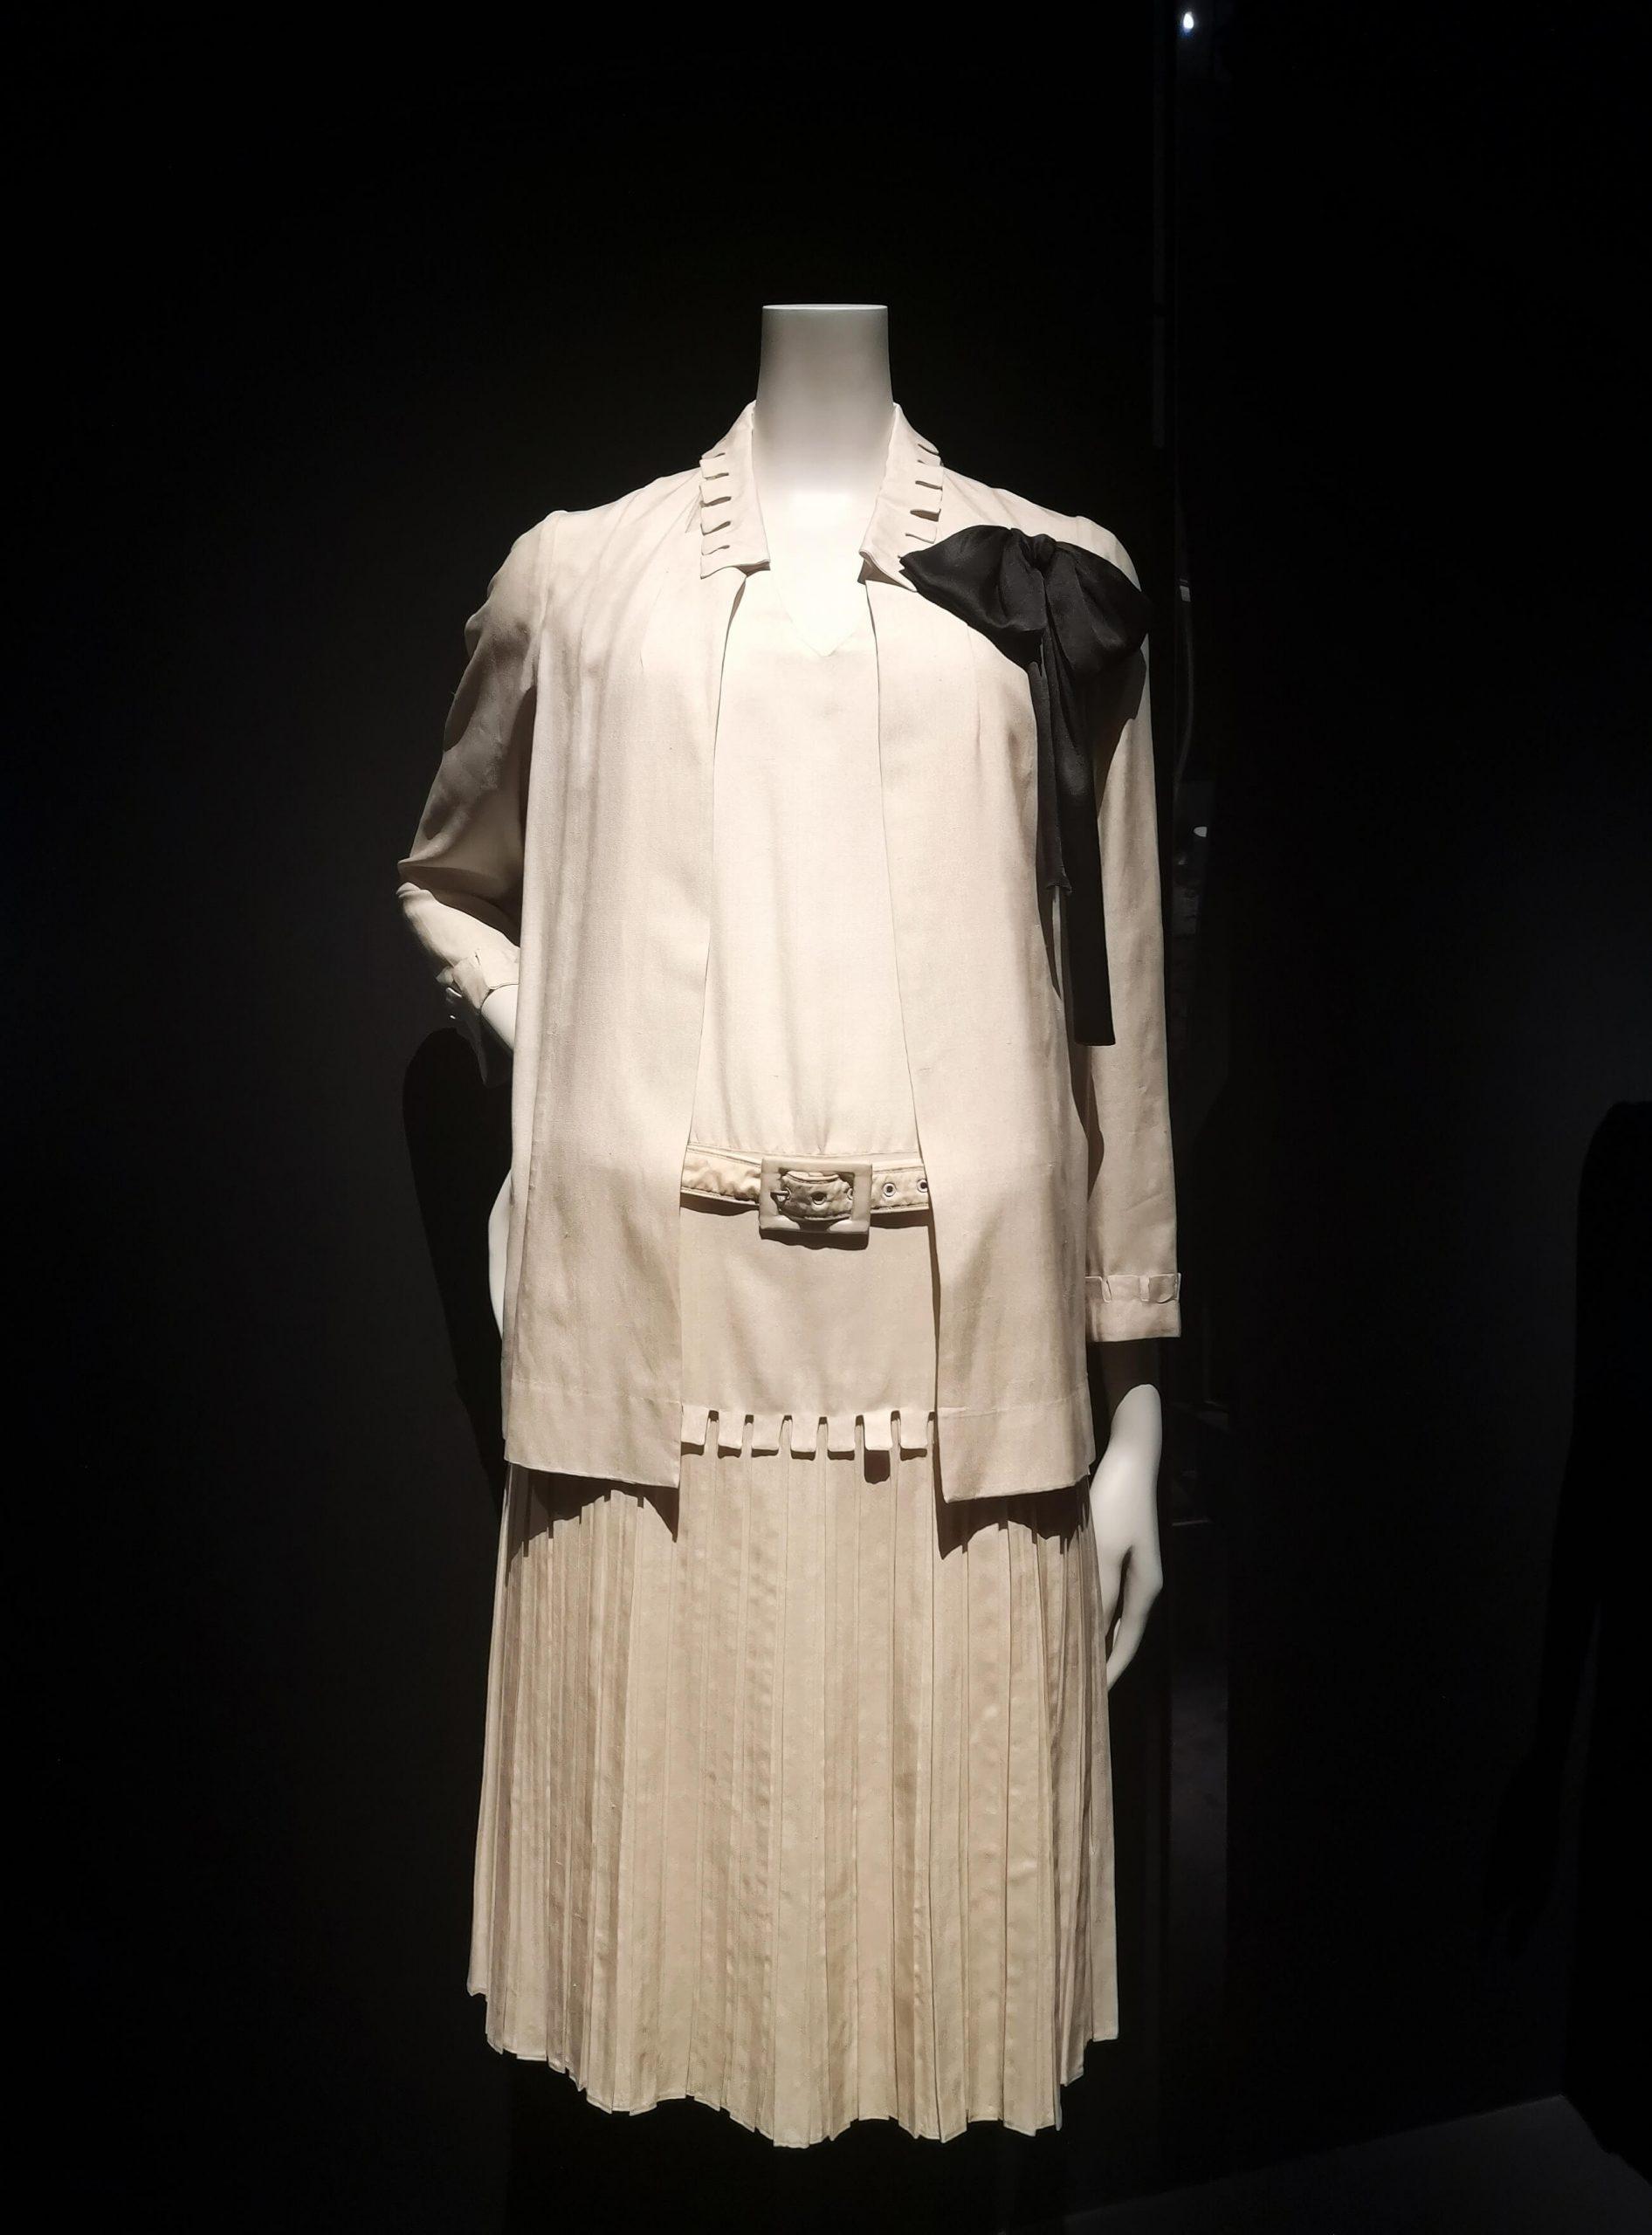 Ensemble / Spring-summer / 1926 / Paris, Patrimoine de Chanel